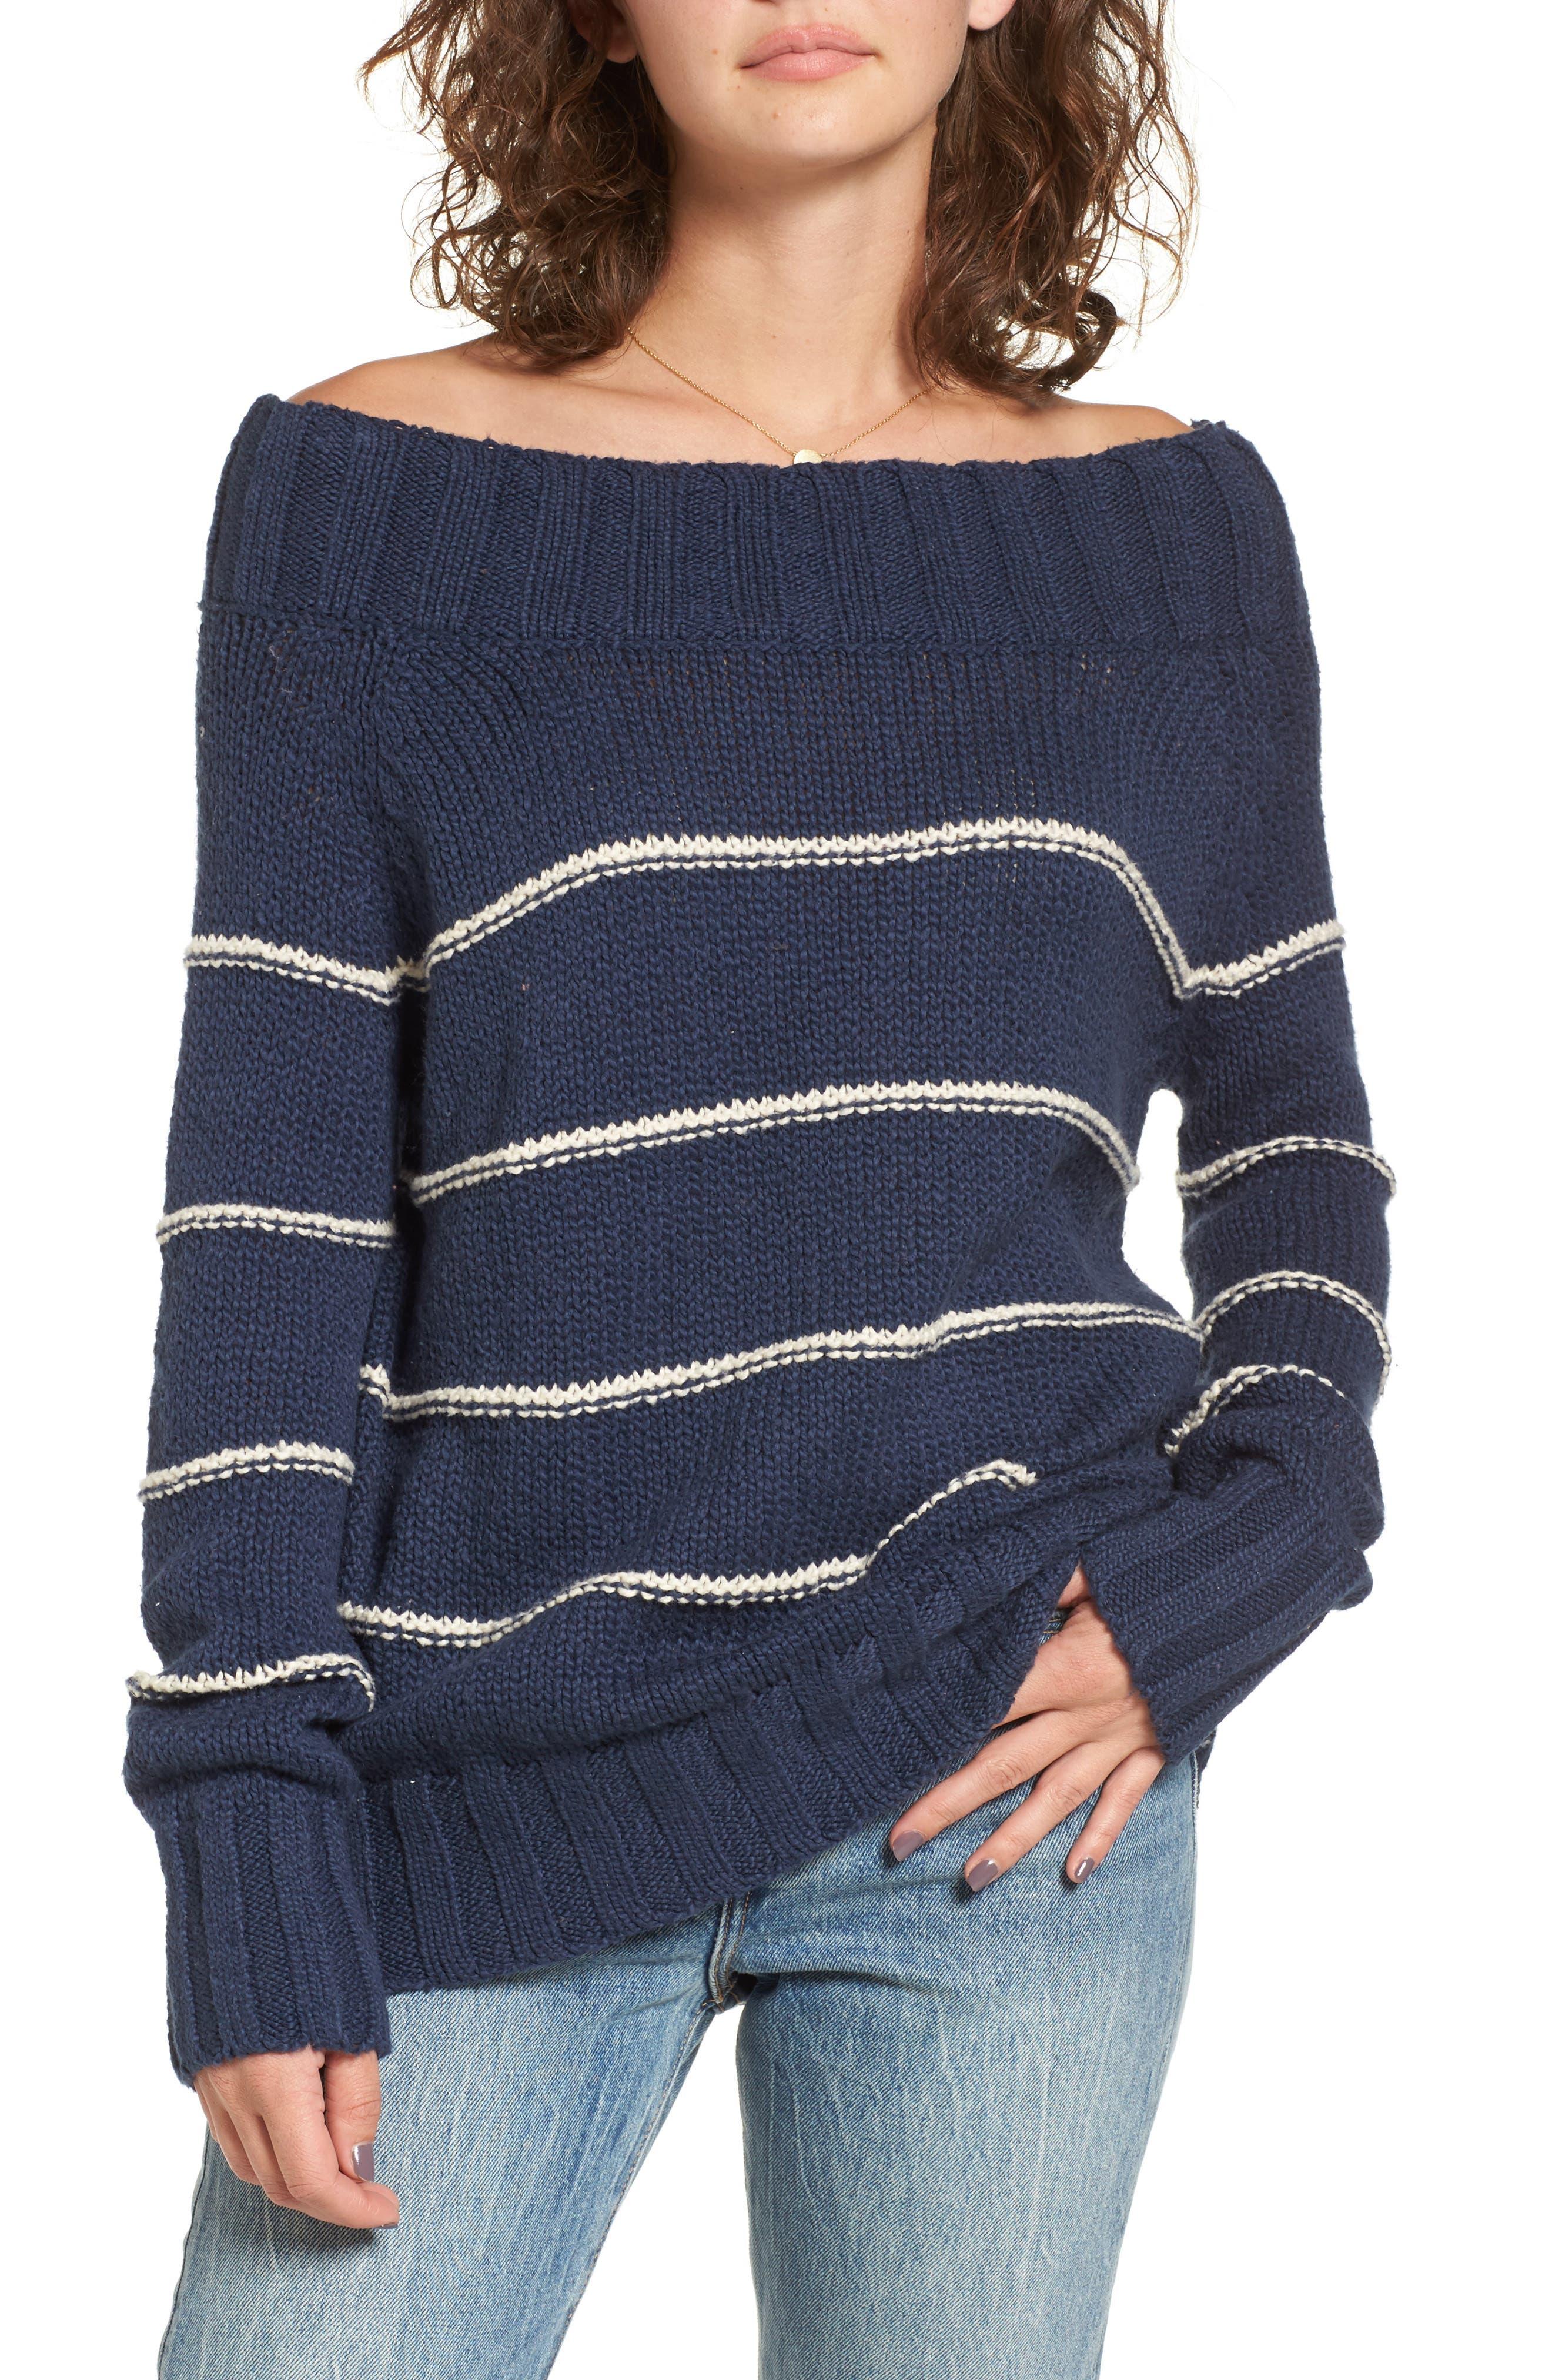 Main Image - Billabong Snuggle Down Off the Shoulder Sweater